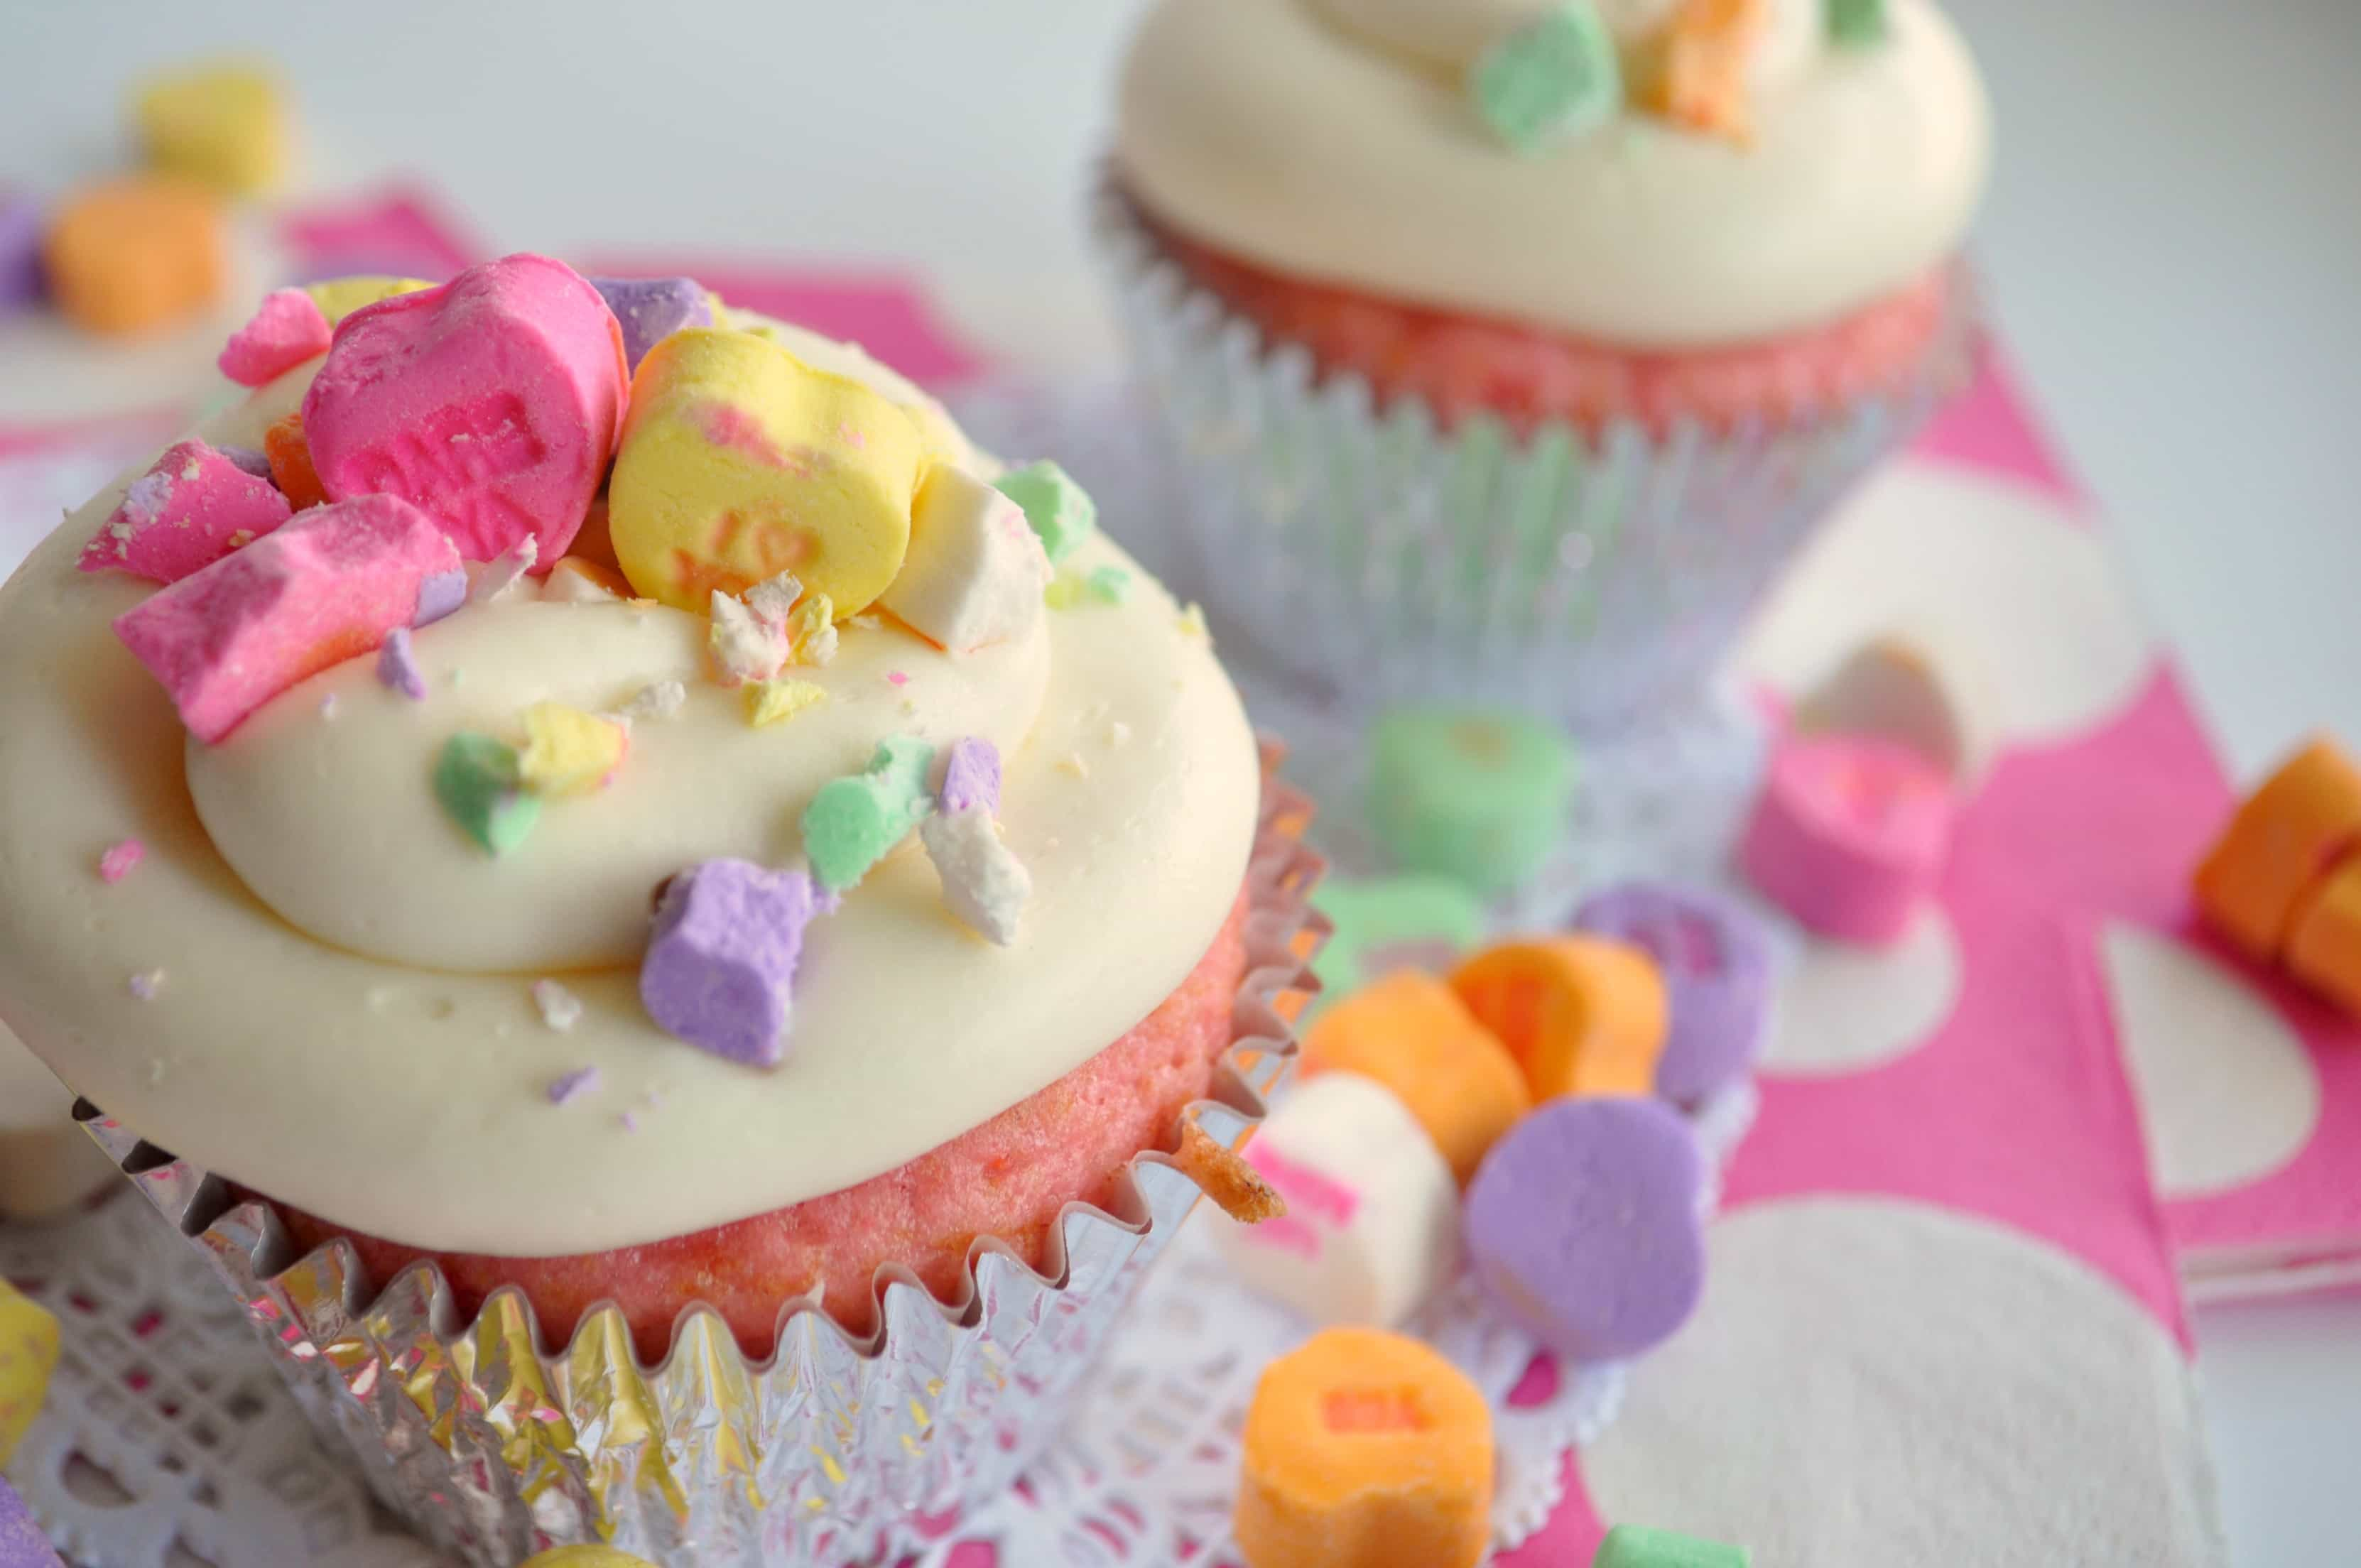 Valentineu0027s Day Cupcake Decorating Ideas {House Of Yumm}